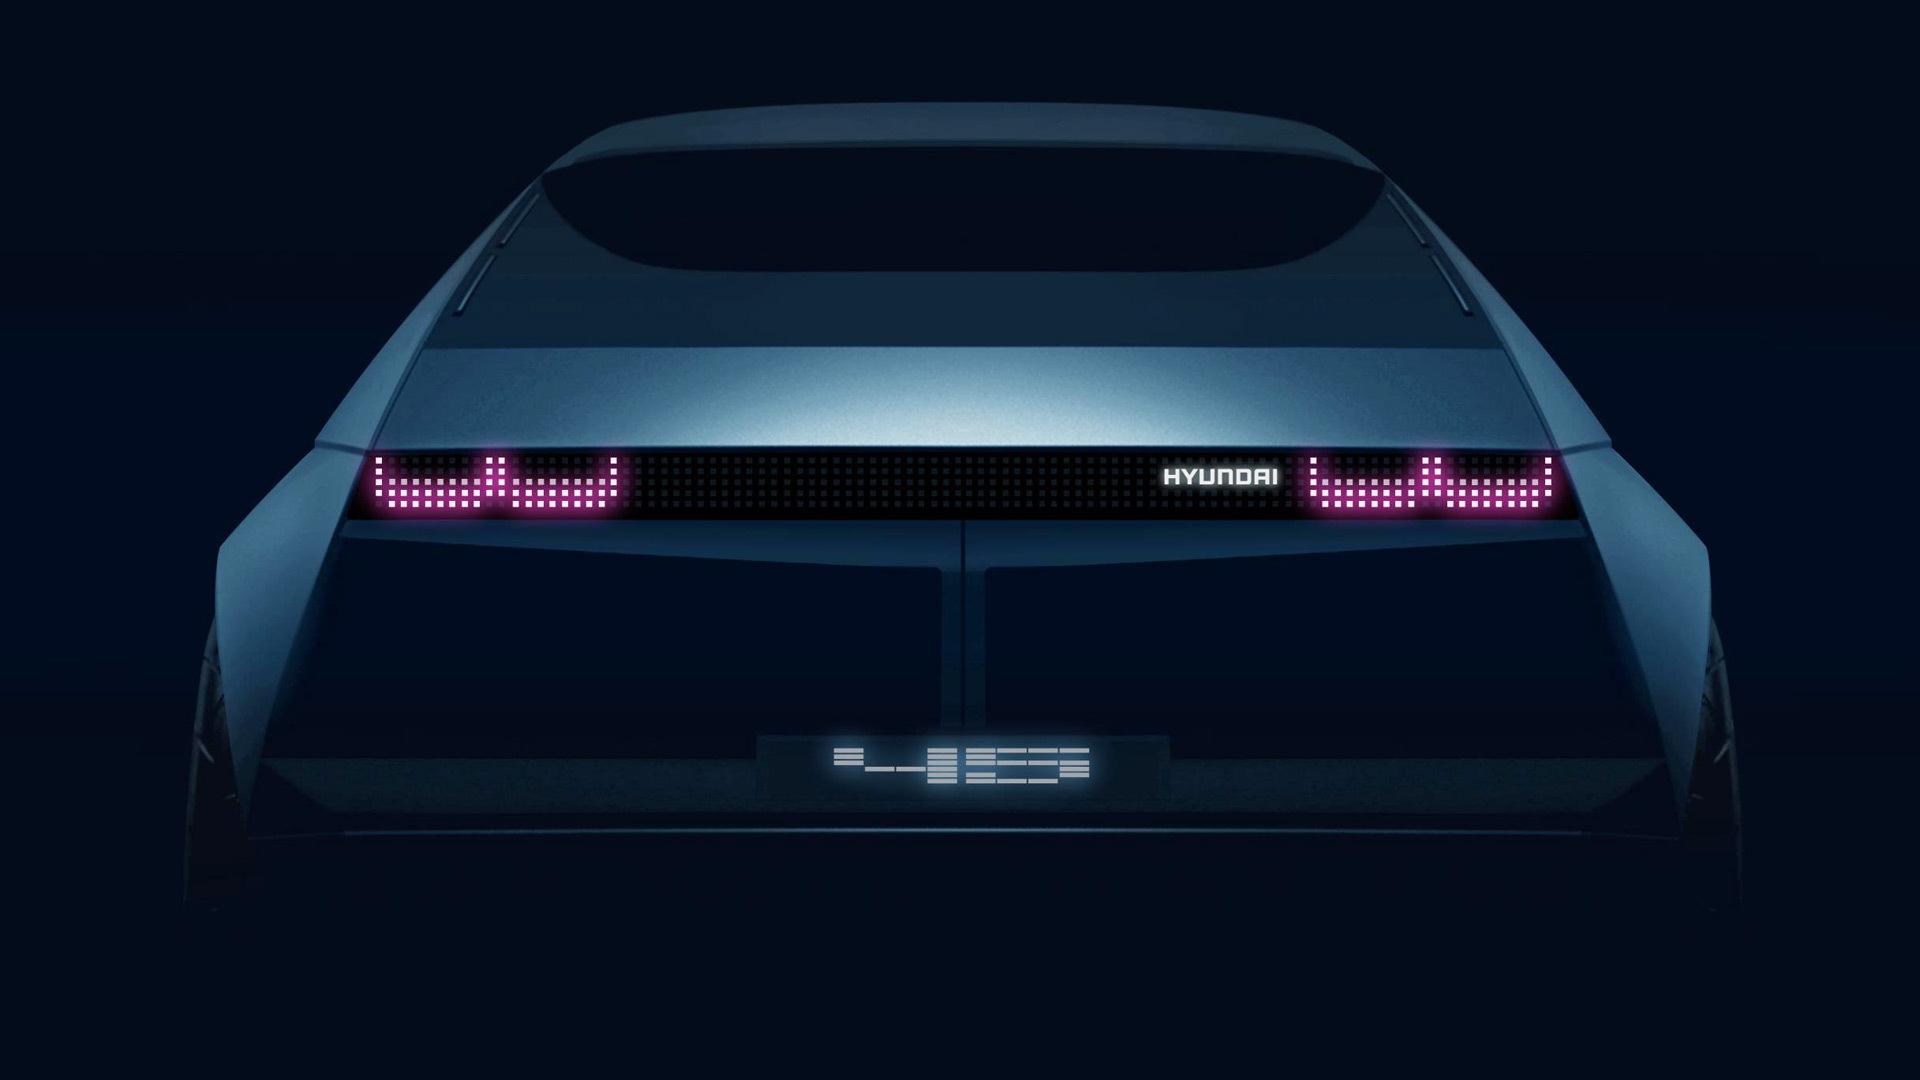 Teaser for Hyundai 45 concept debuting at 2019 Frankfurt auto show